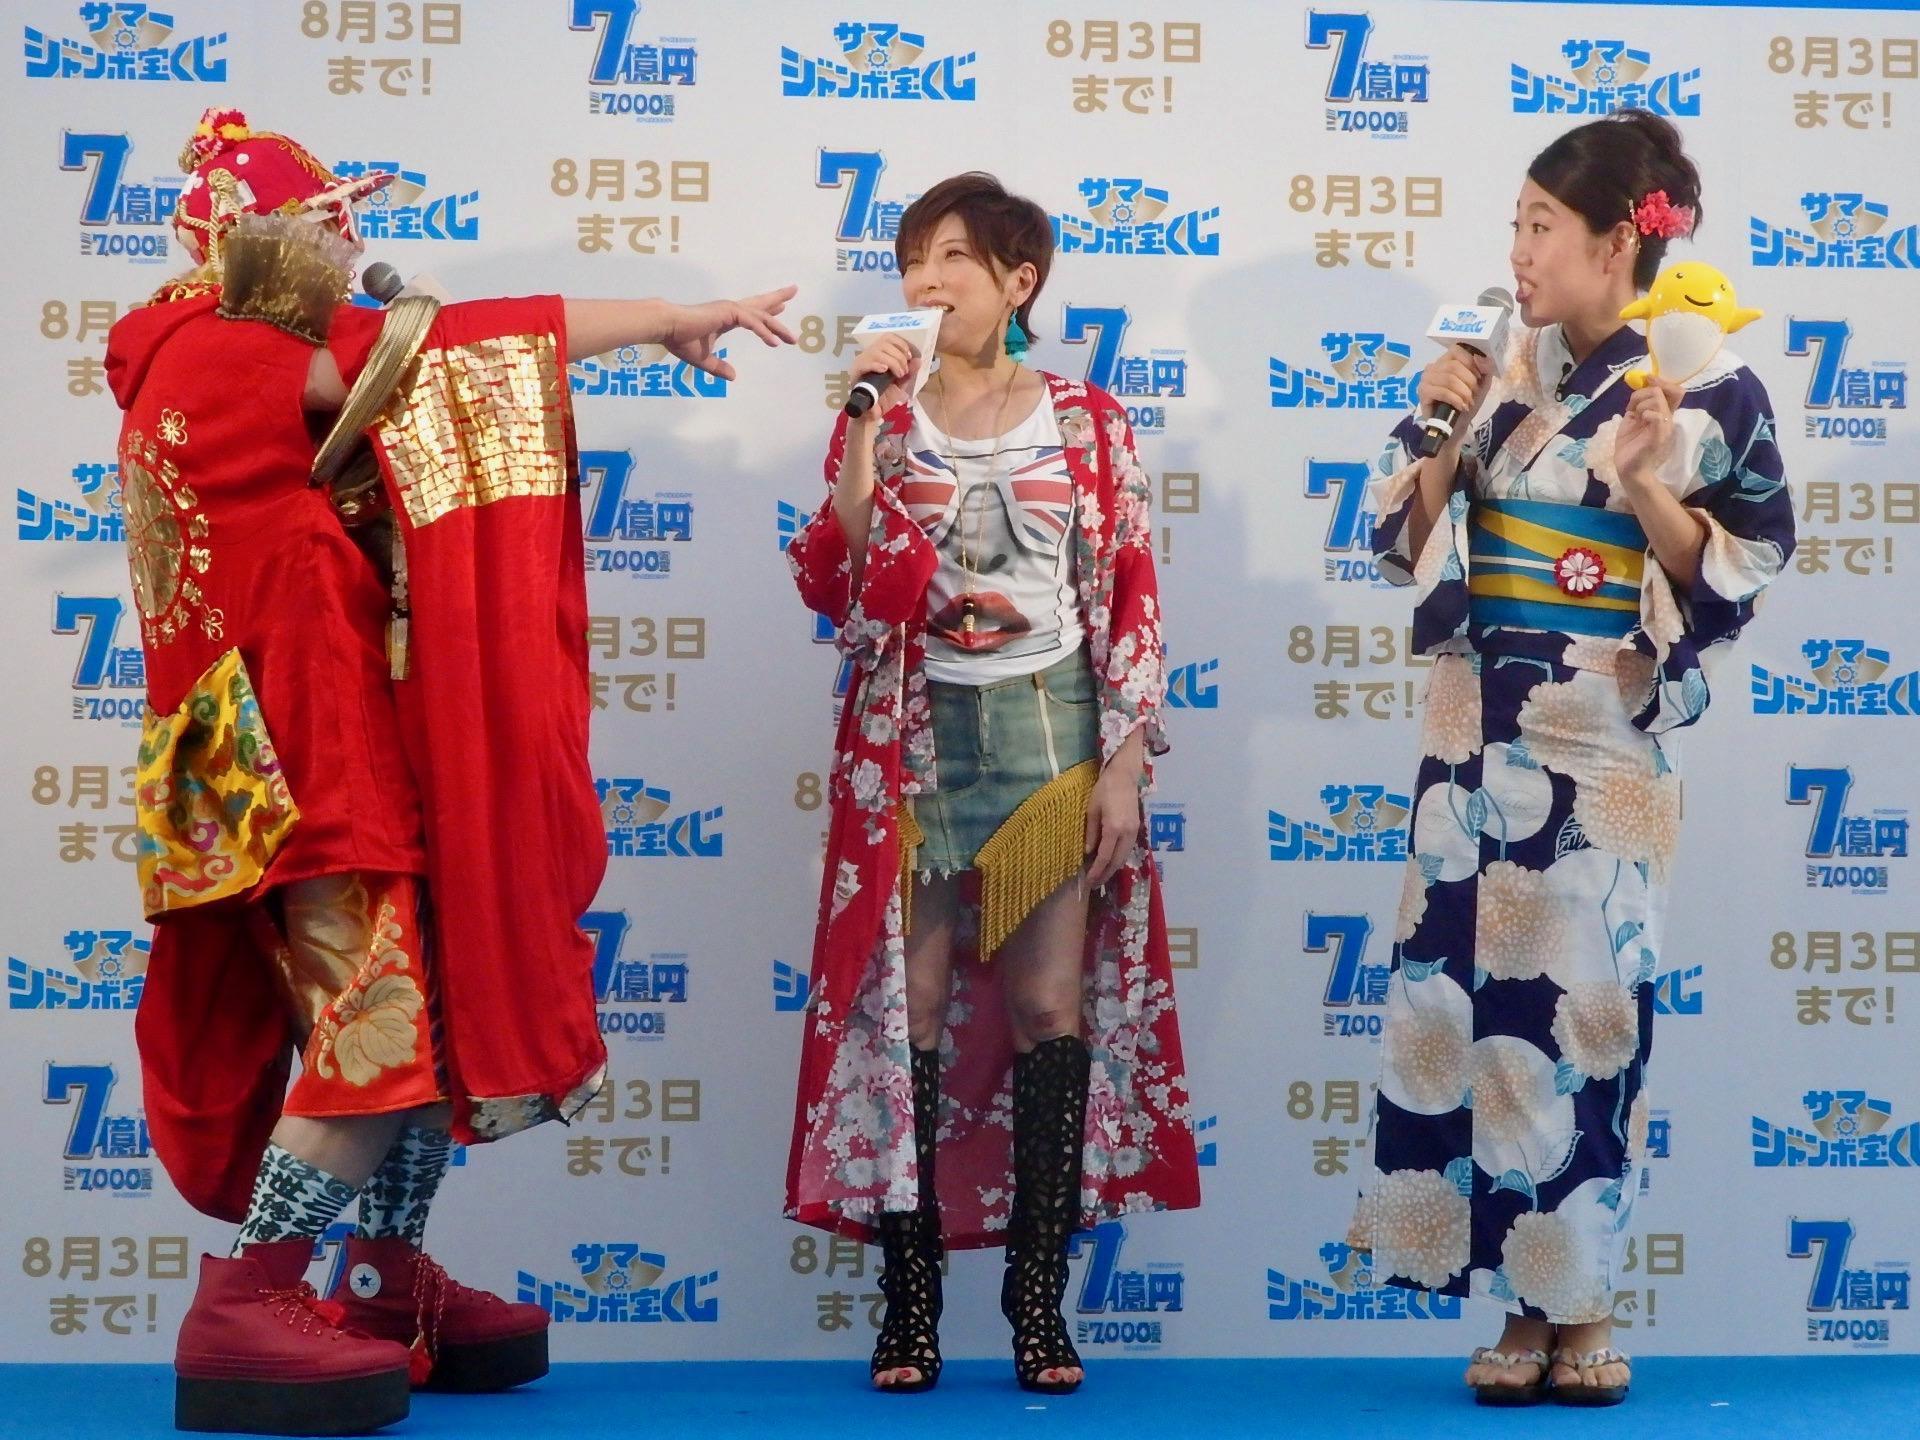 http://news.yoshimoto.co.jp/20180709202954-897d4283d56498ea3455dac3c732a1ea4ac77024.jpg